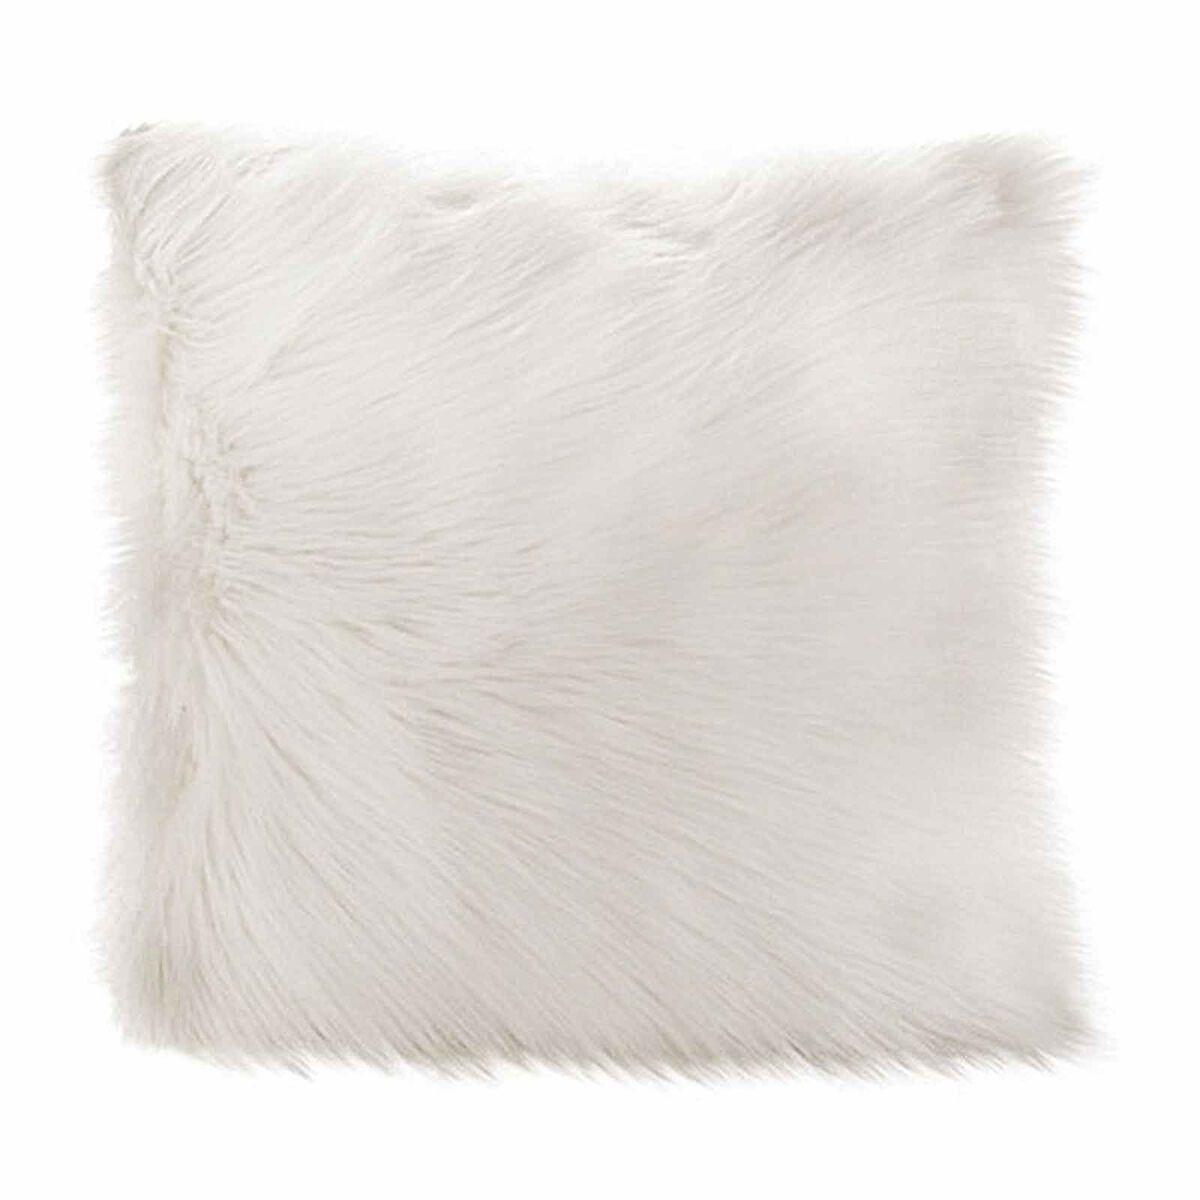 kissen felloptik offweiss ca l 45 x b 45 cm kissenbezug 100 polyester depot de. Black Bedroom Furniture Sets. Home Design Ideas